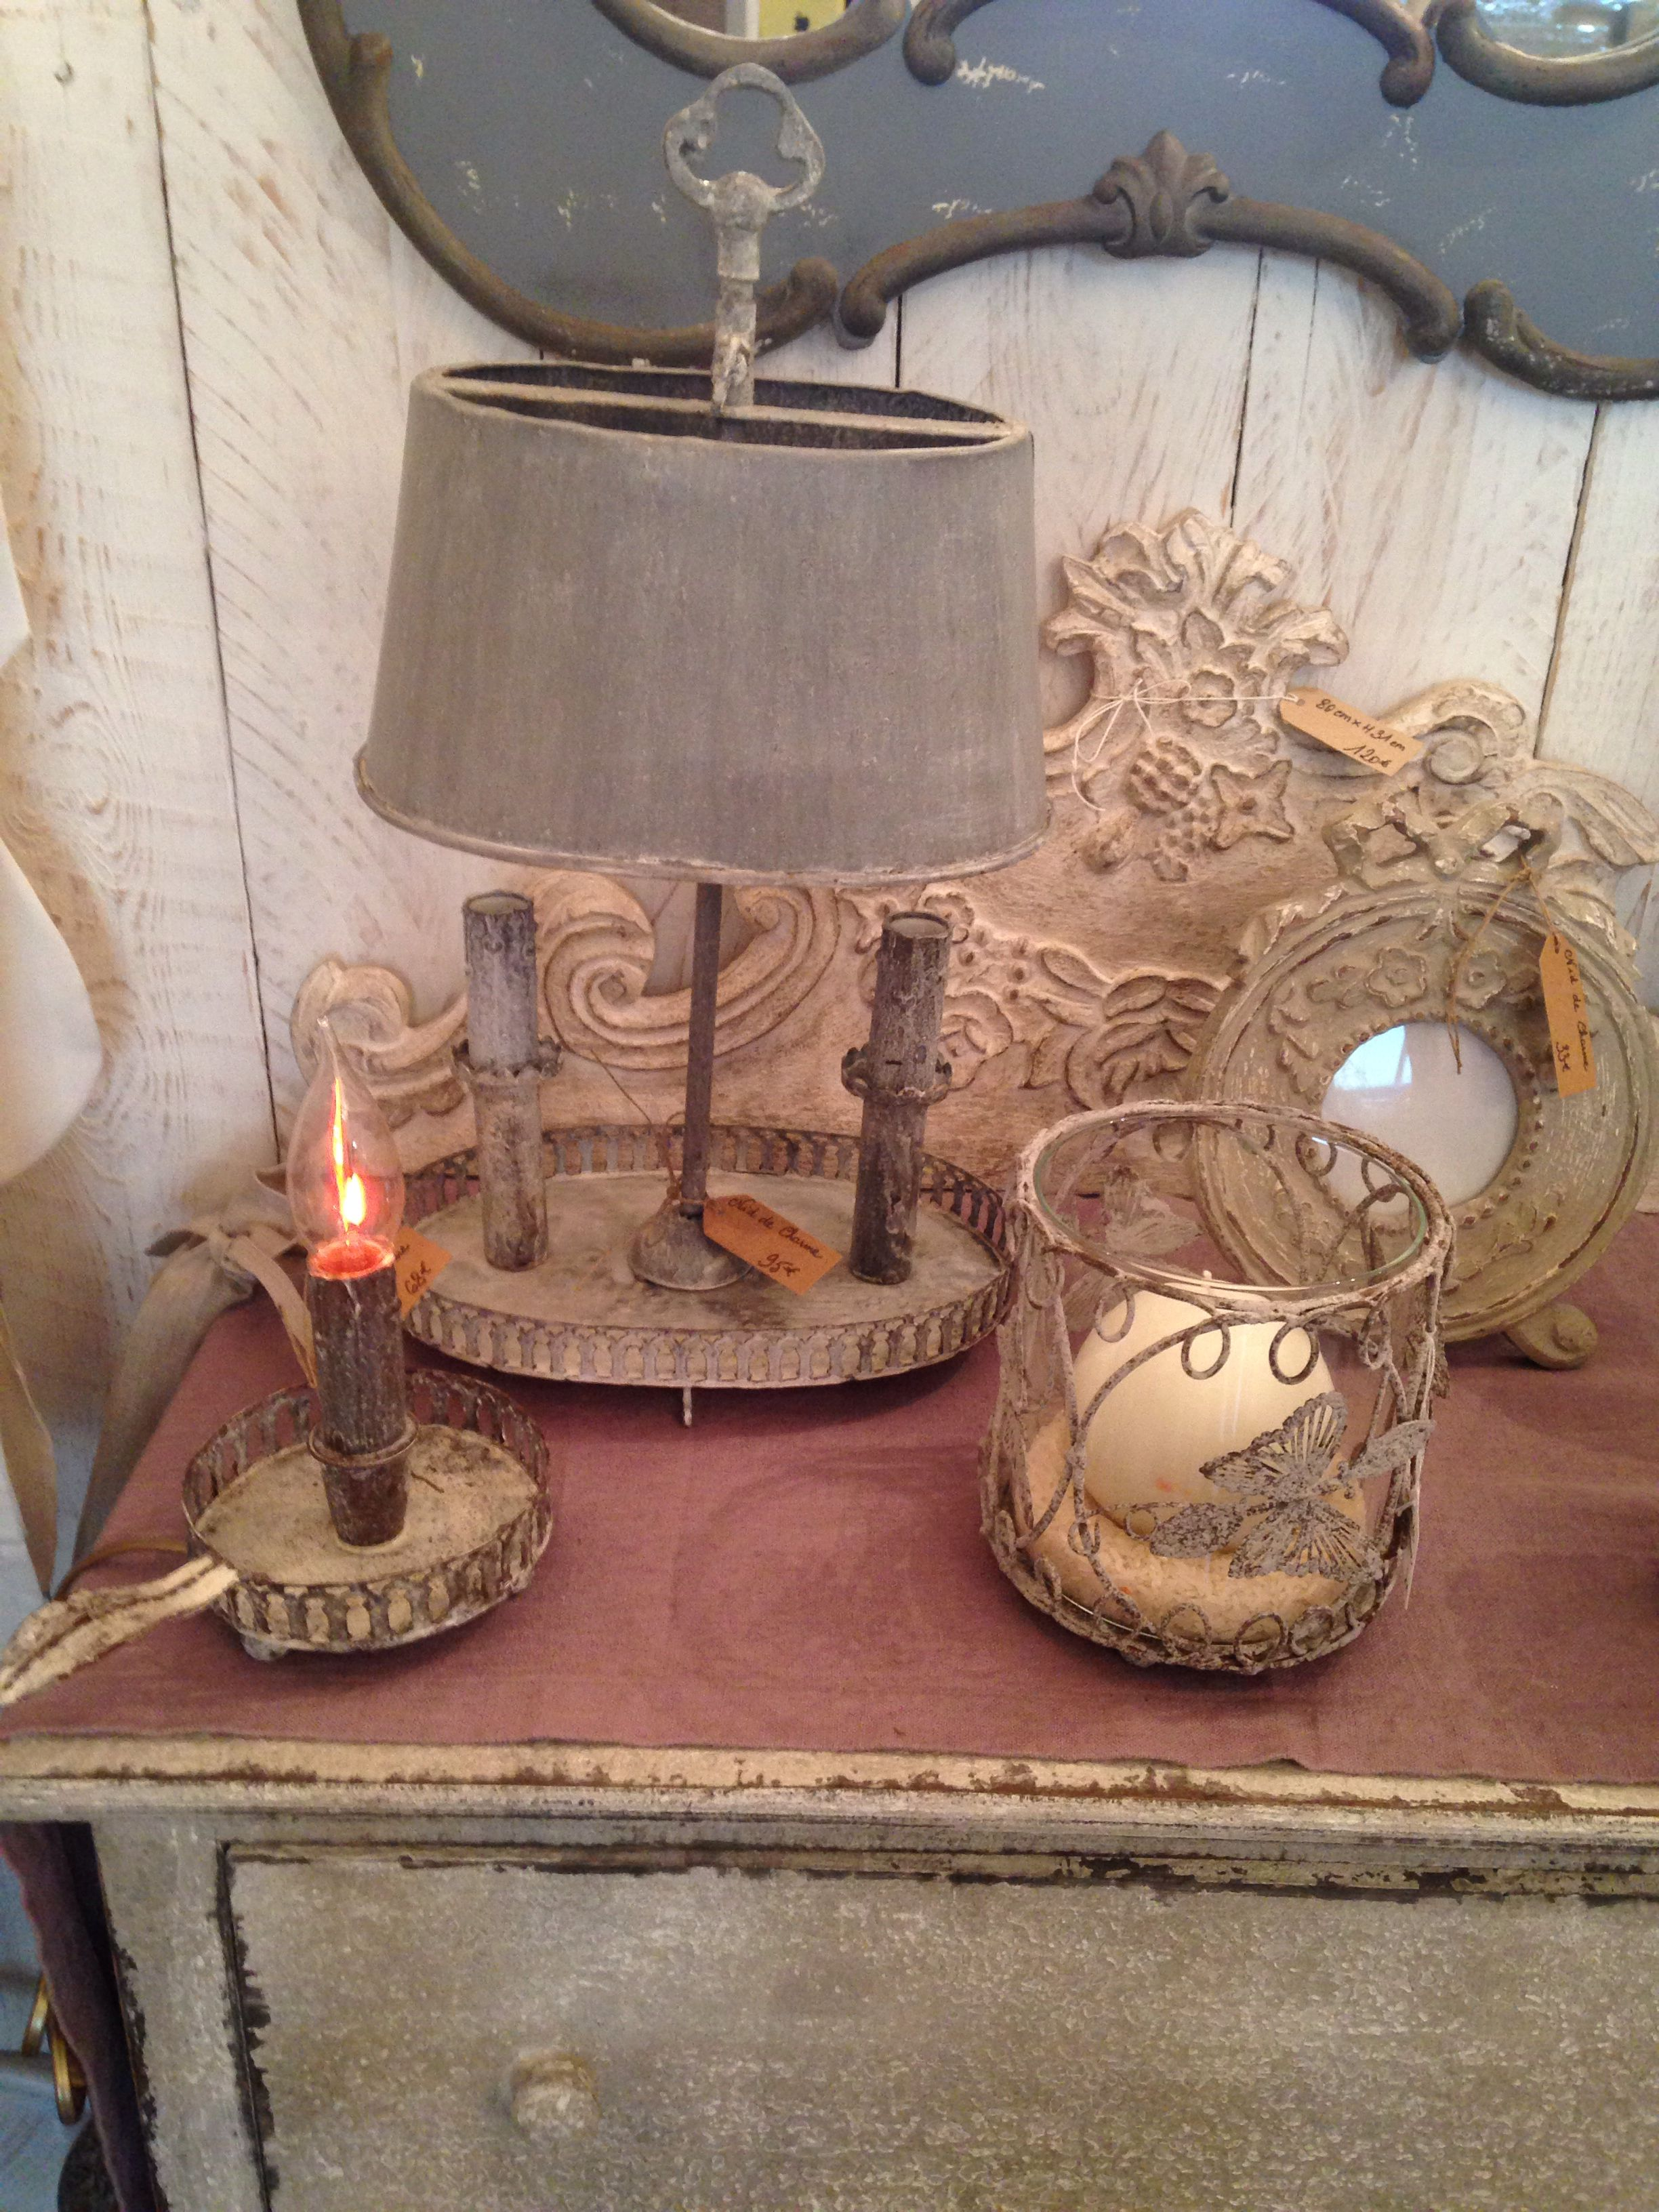 Lampes et fronton Coquecigrues | #niddecharme#78 | Pinterest